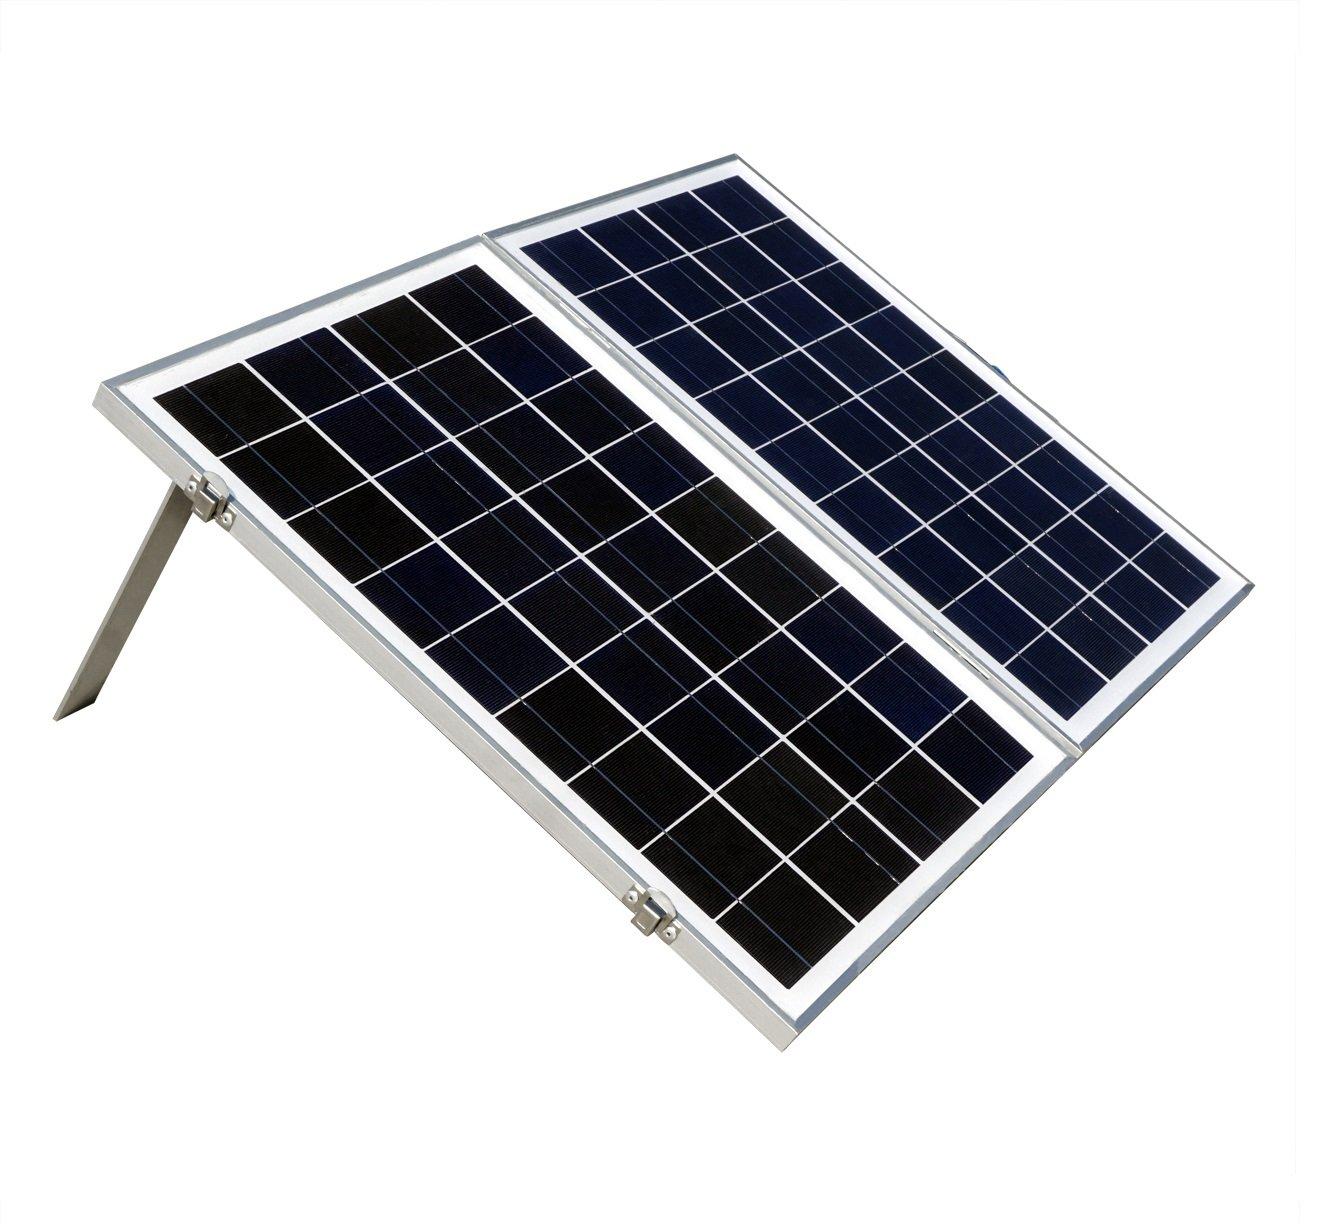 Buy ECO-WORTHY 80watts Photovoltaic Portable Folding Poly